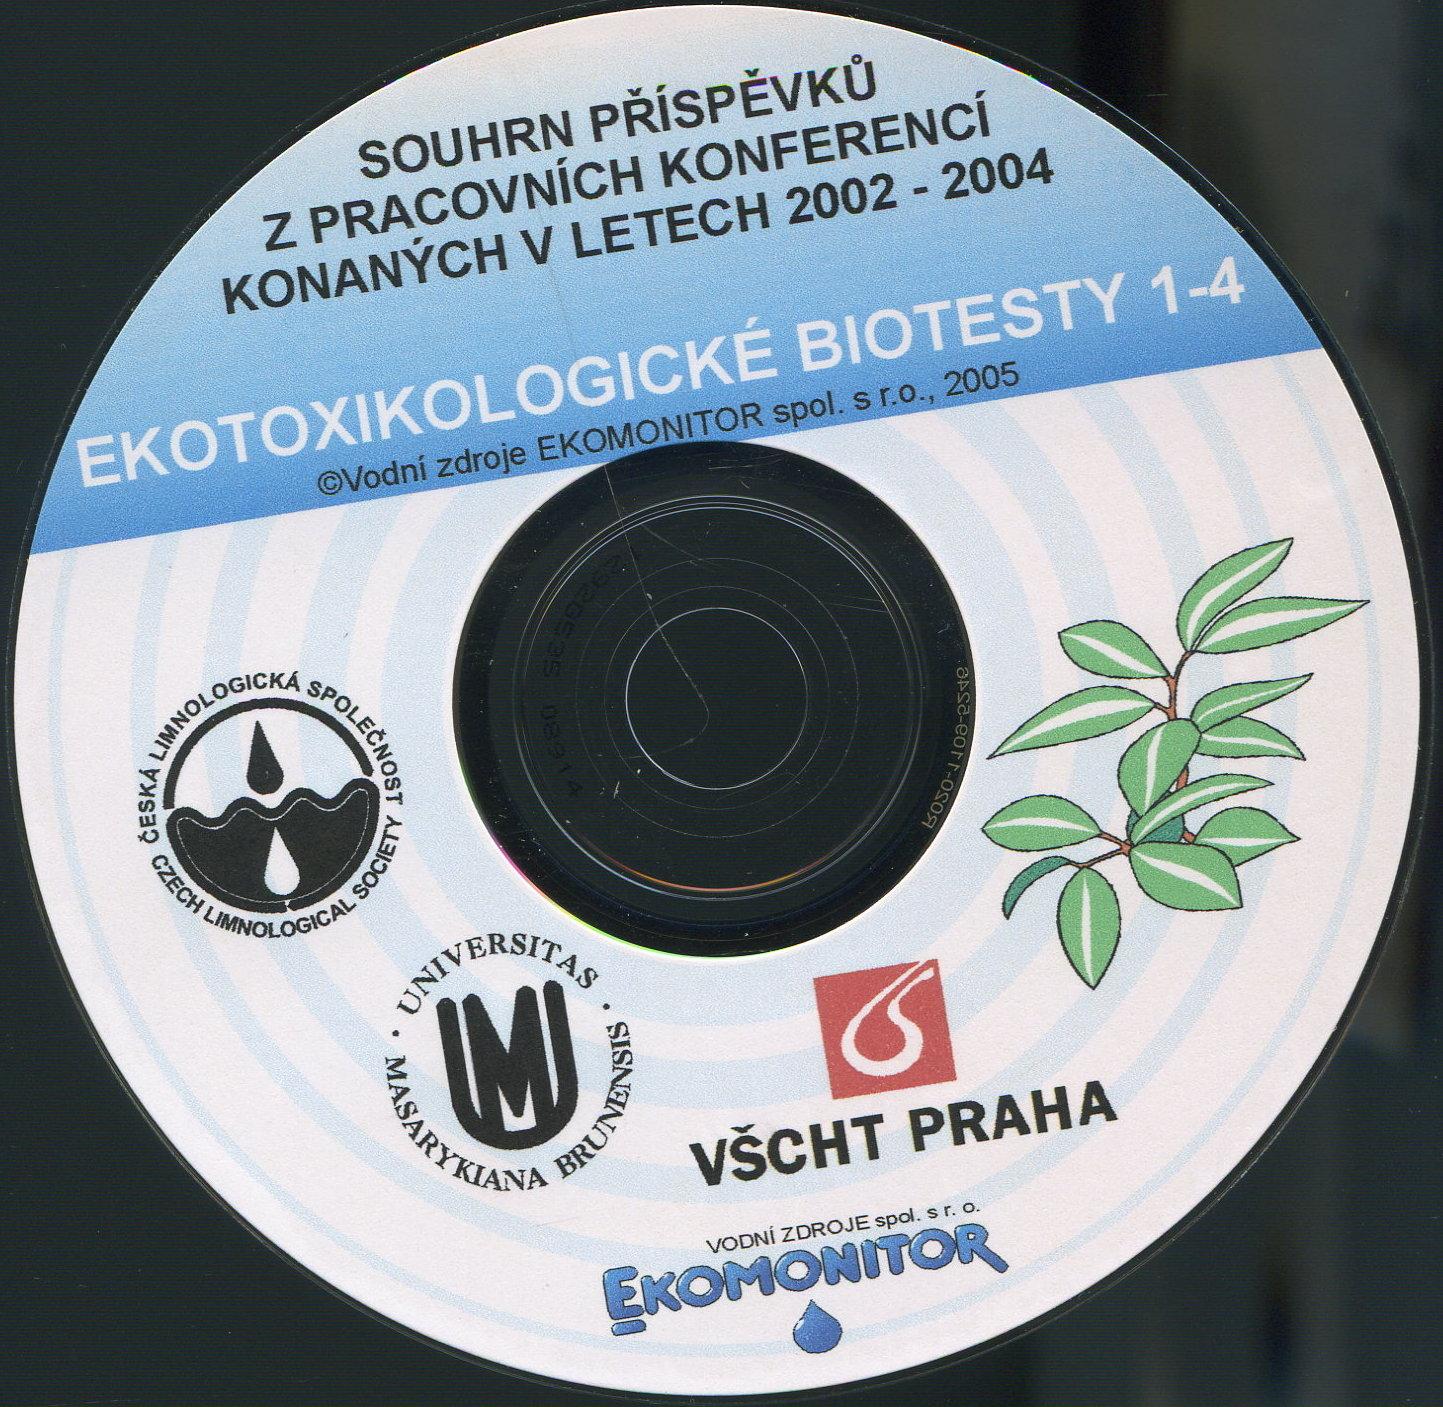 Ekotoxikologické biotesty 1-4